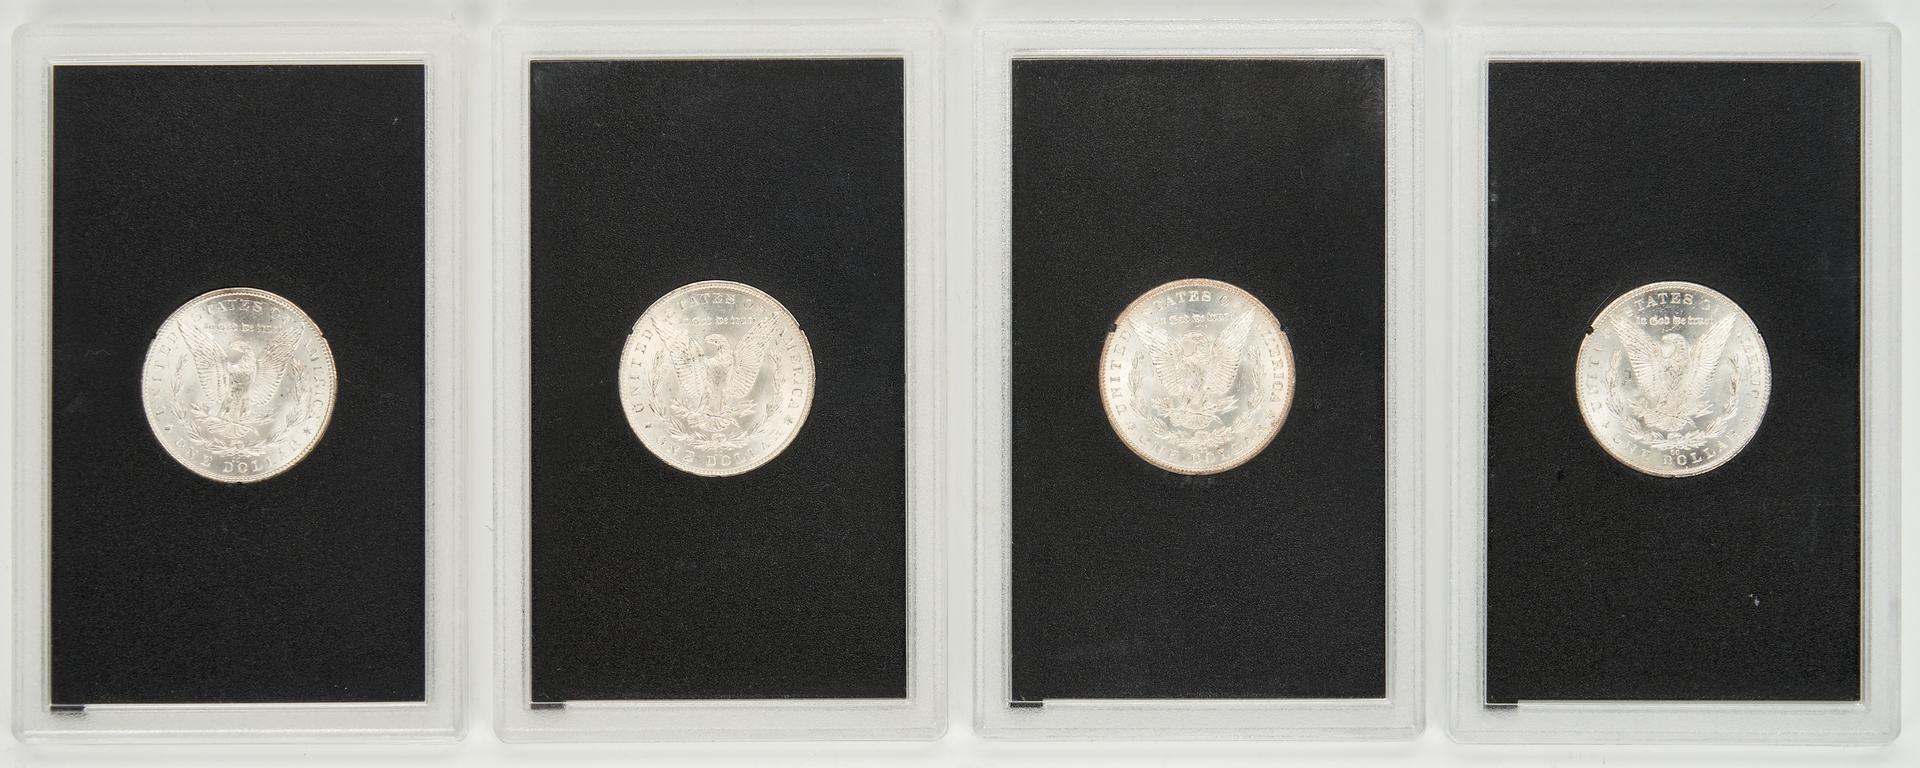 Lot 741: 4 GSA Morgan CC Silver Dollars, Uncirculated & Mixed